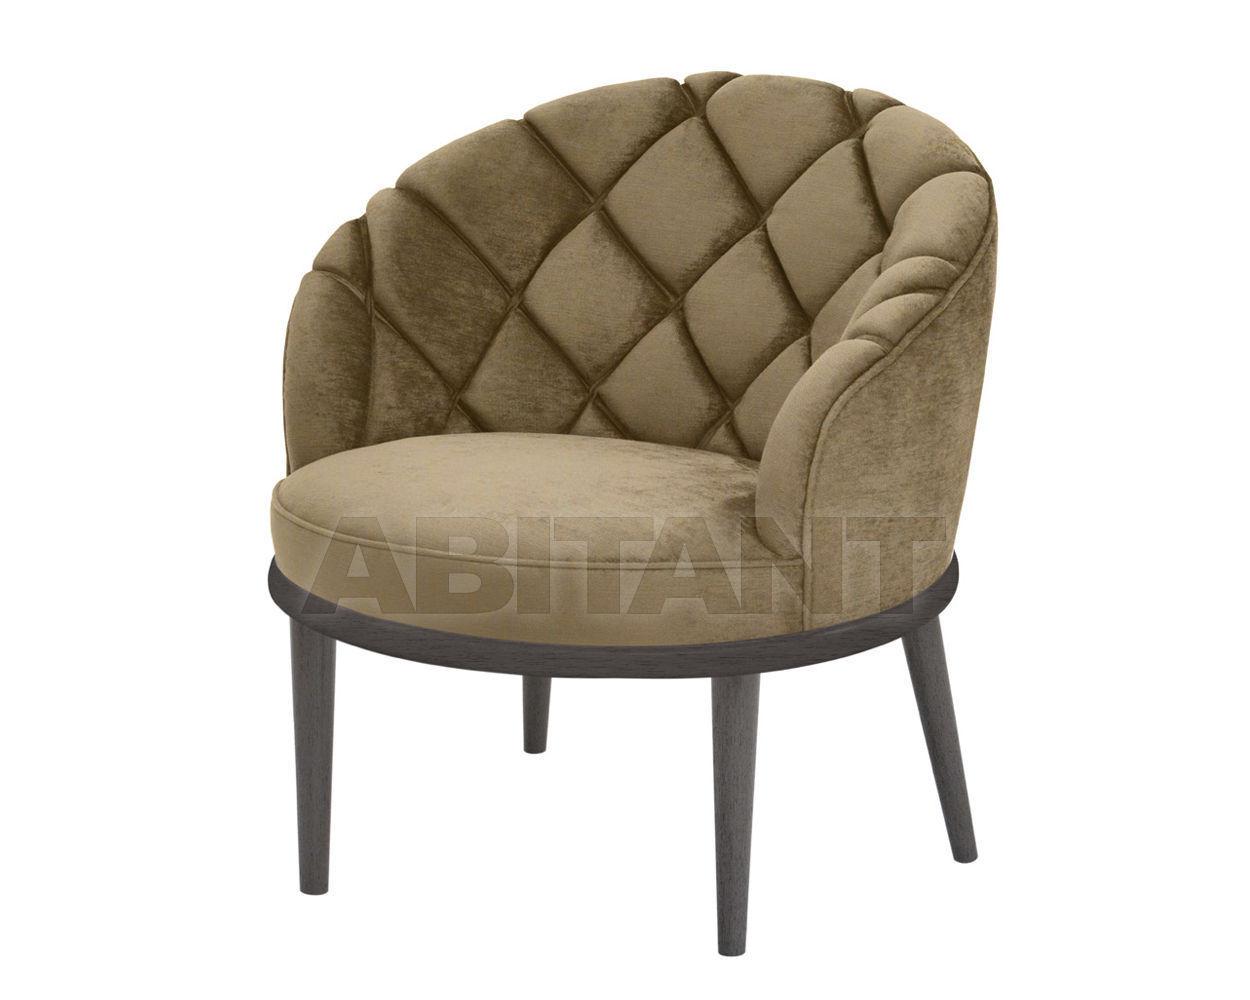 Купить Кресло MONTE CARLO Frato 2018 FUP010014AAQ